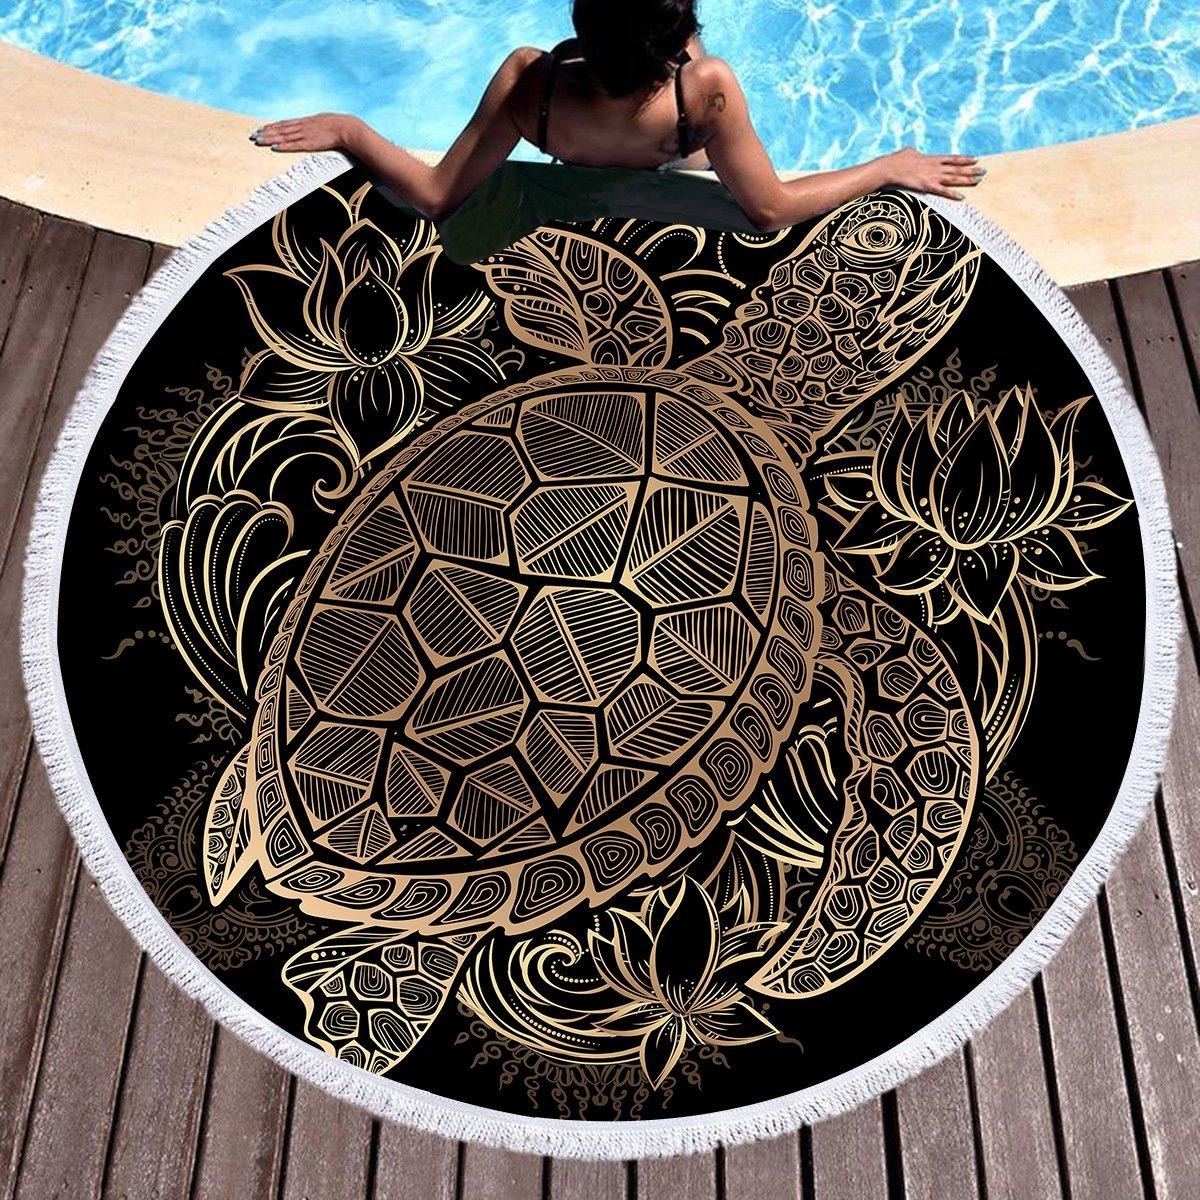 Sleepwish Gold Beach Towel, Round Beach Towel Blanket with Tassels, Boho Round Tapestry, Circle Beach Mats (Turtle Floral, 60'')